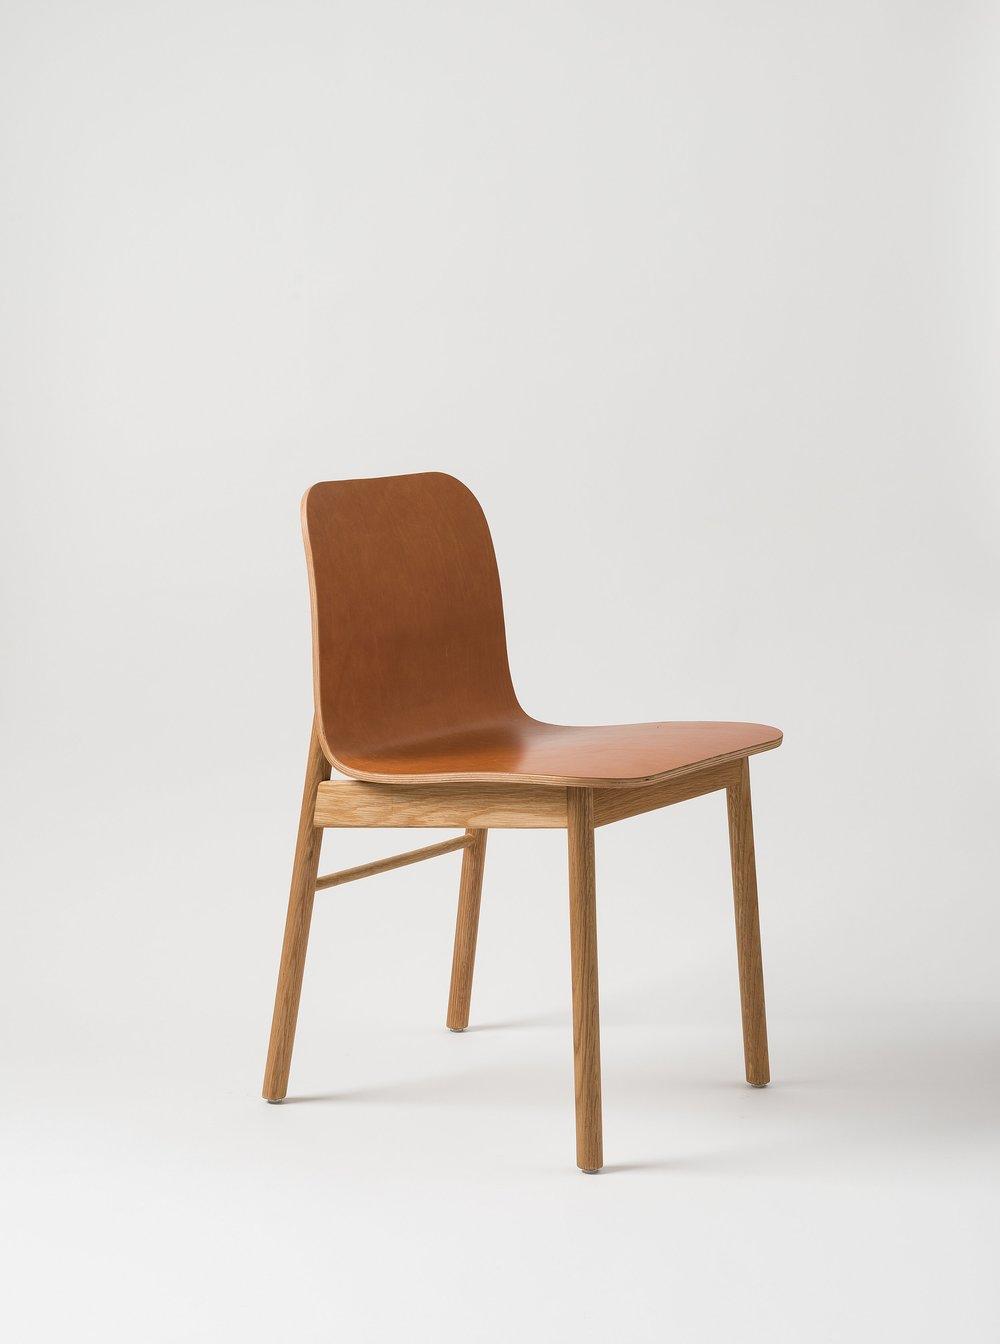 Aspen Chair w/ Wooden Legs $890